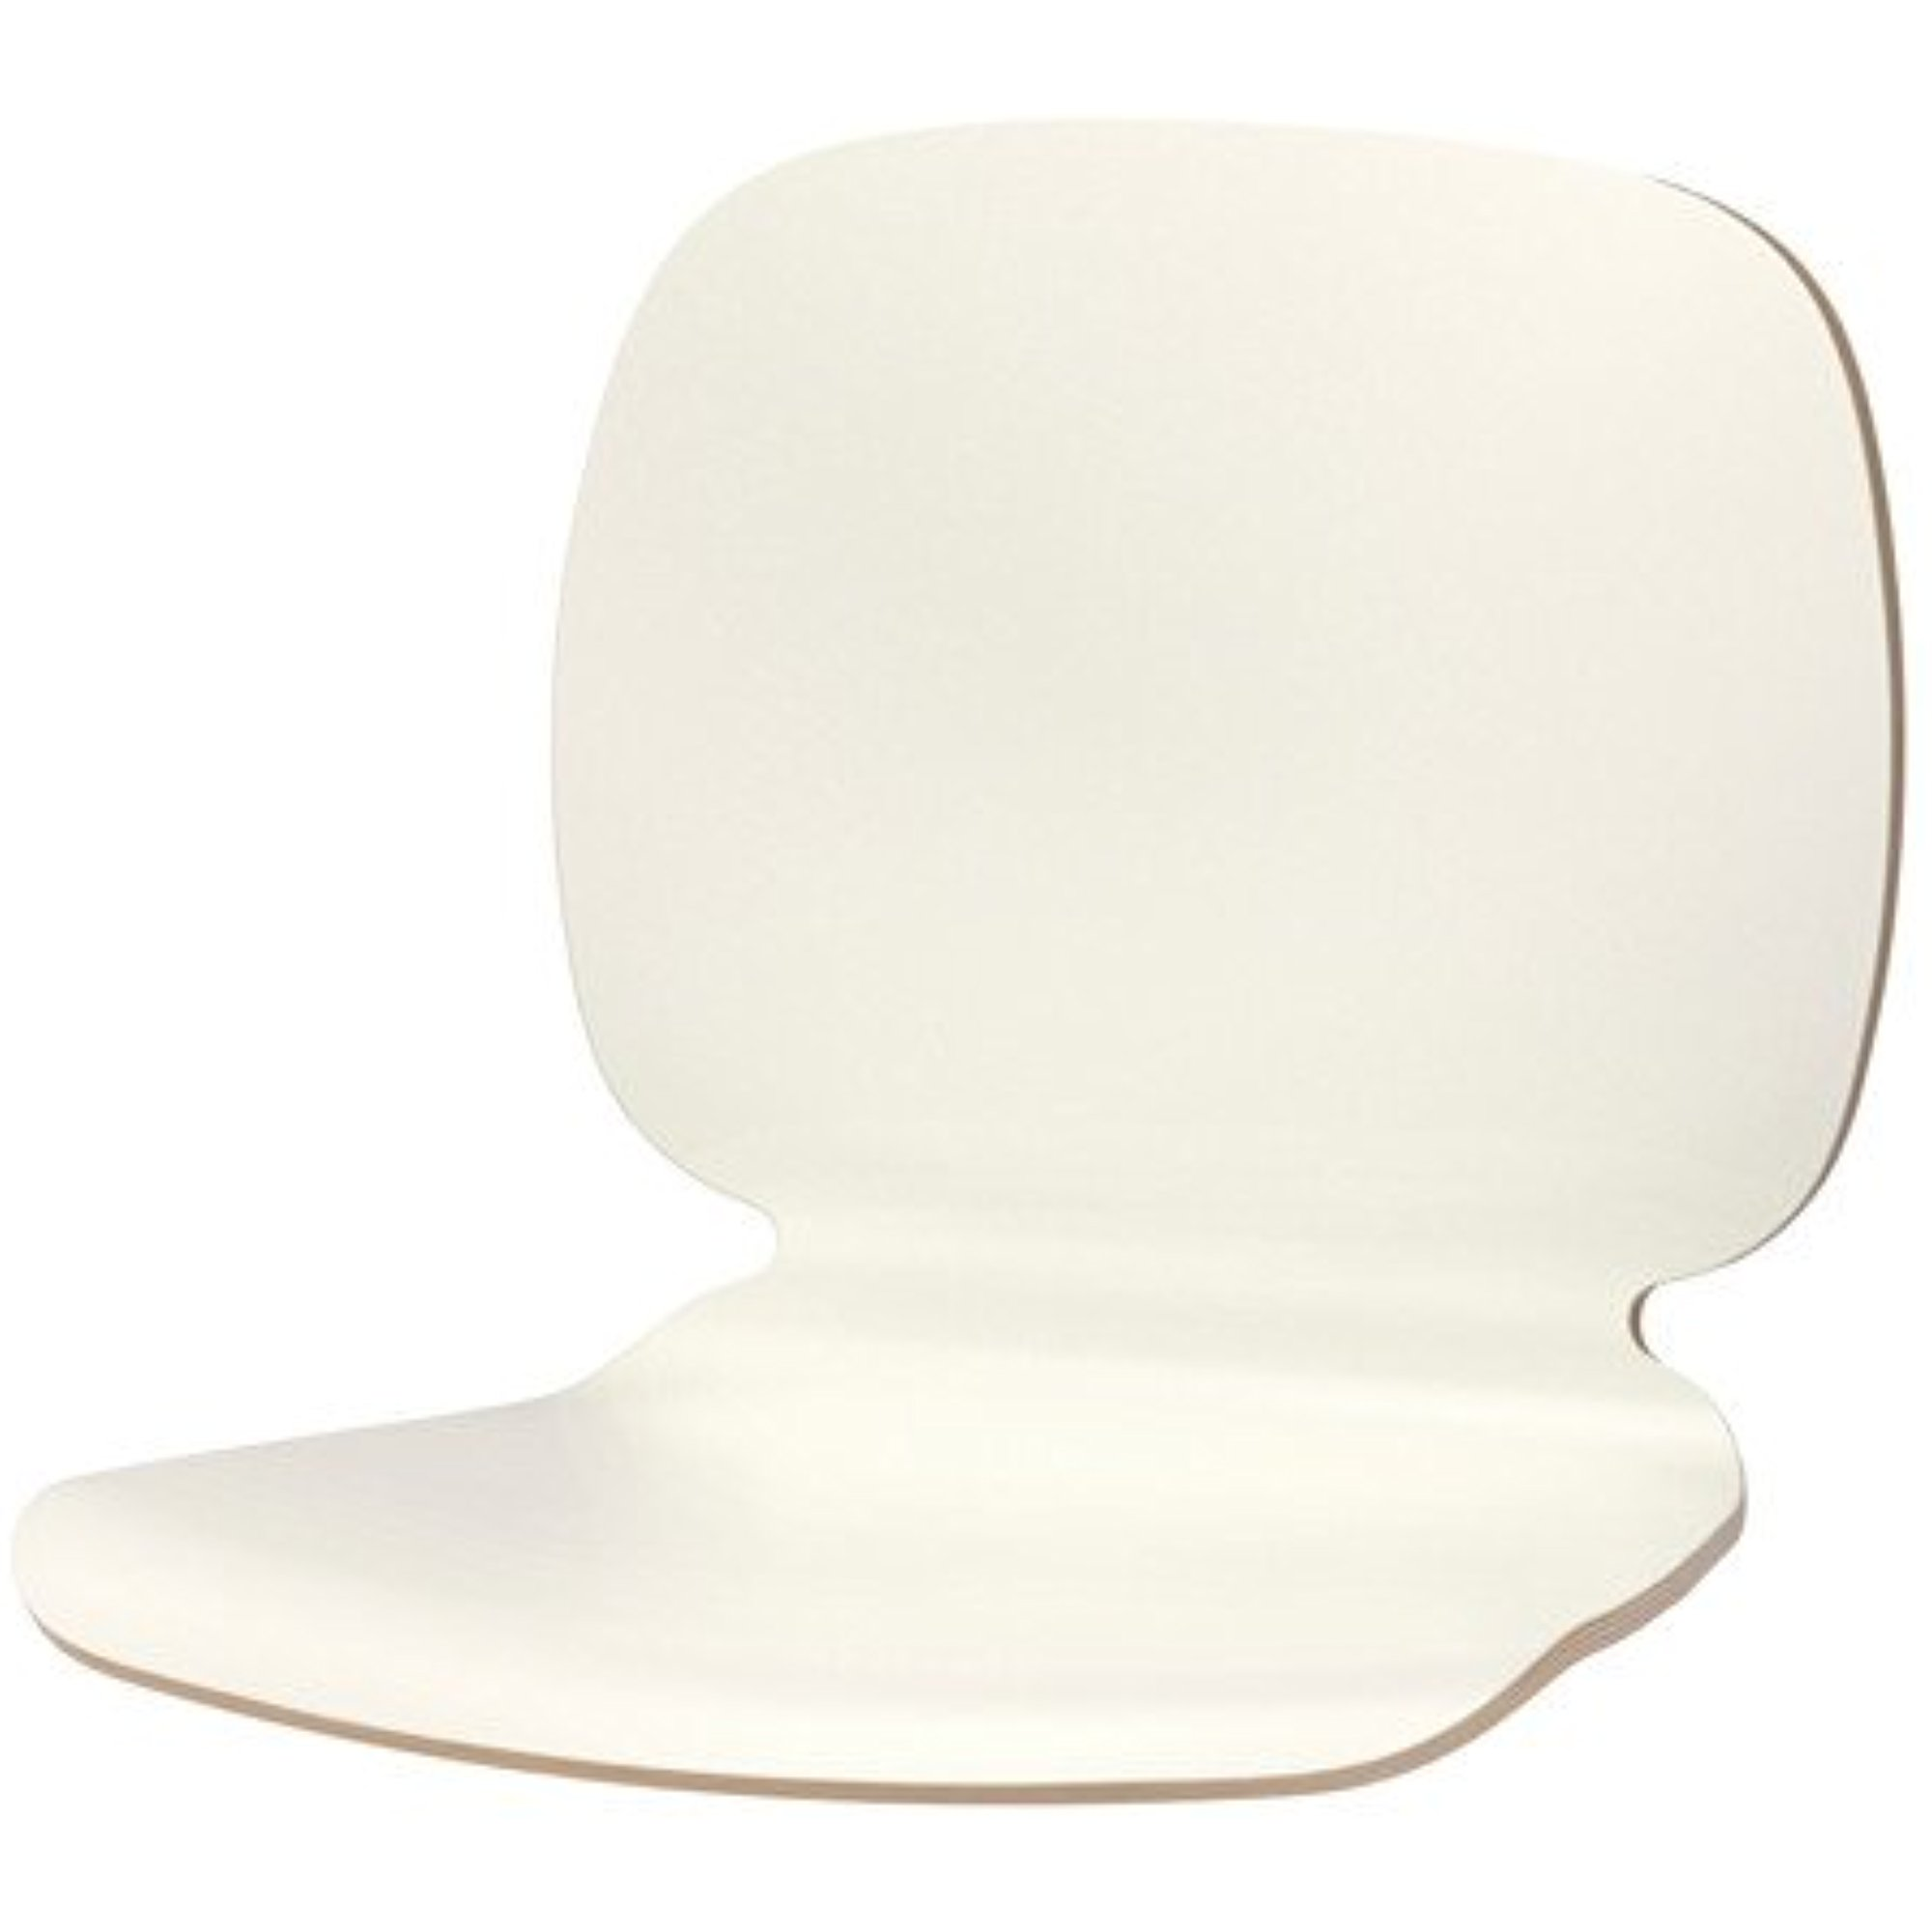 IKEA Seat shell, white 828.112926.3826